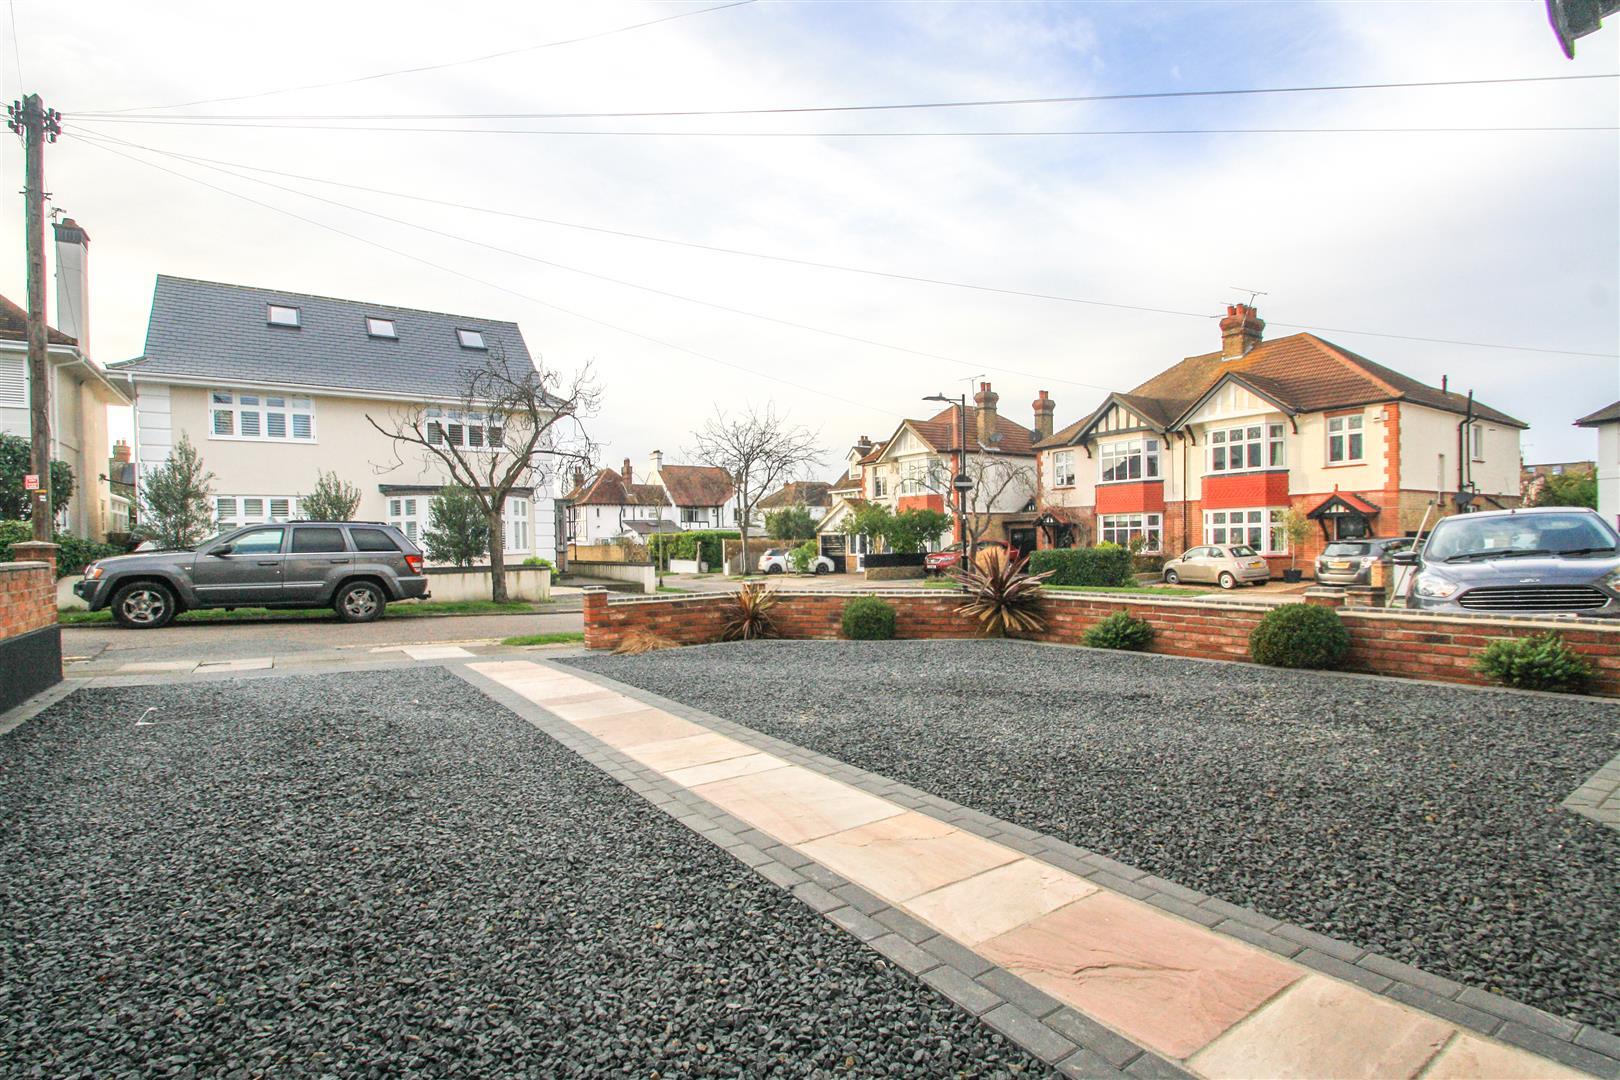 Driveway - street view